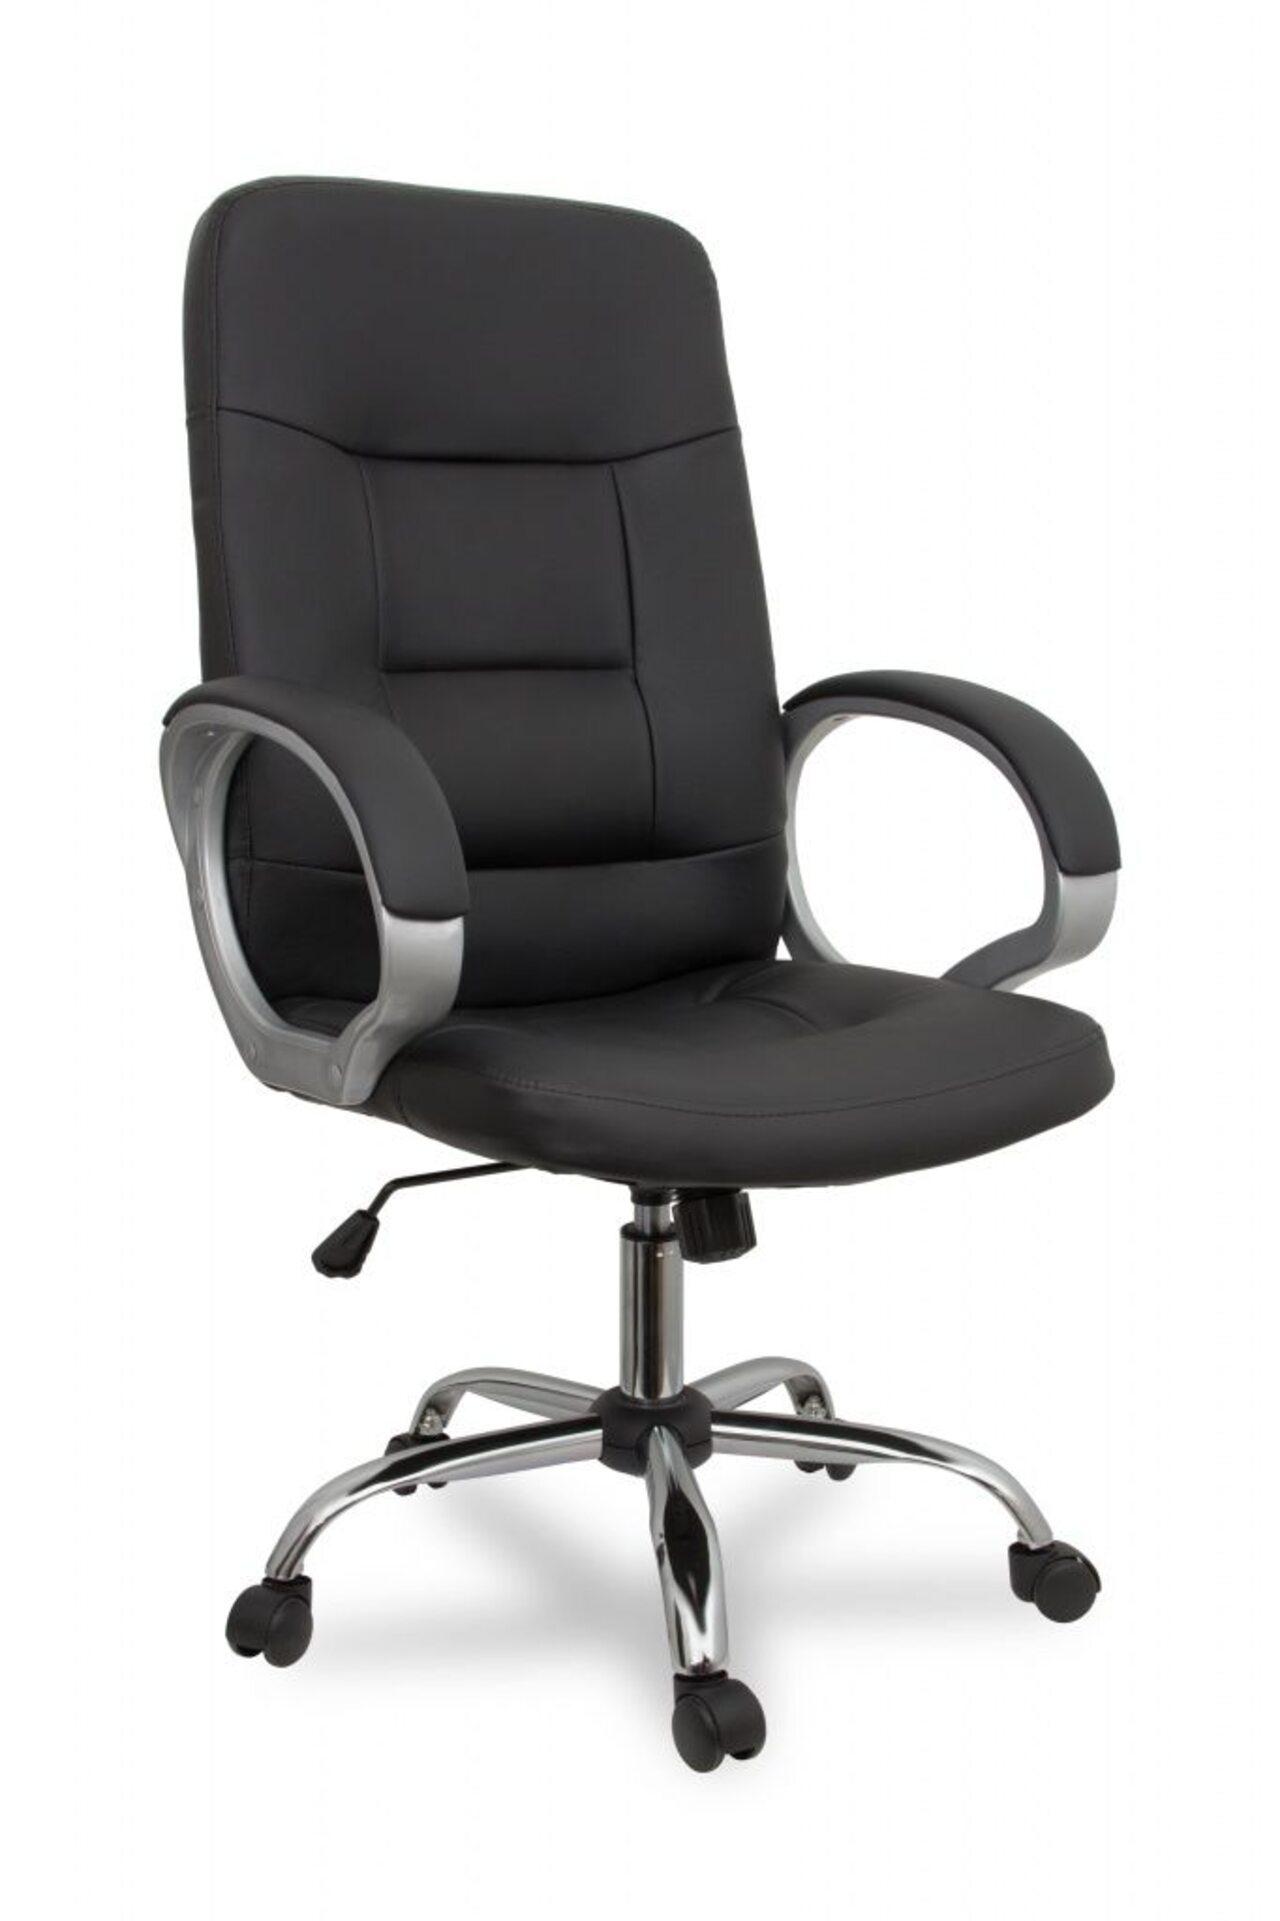 Кресло руководителя College BX-3225-1 - фото 1